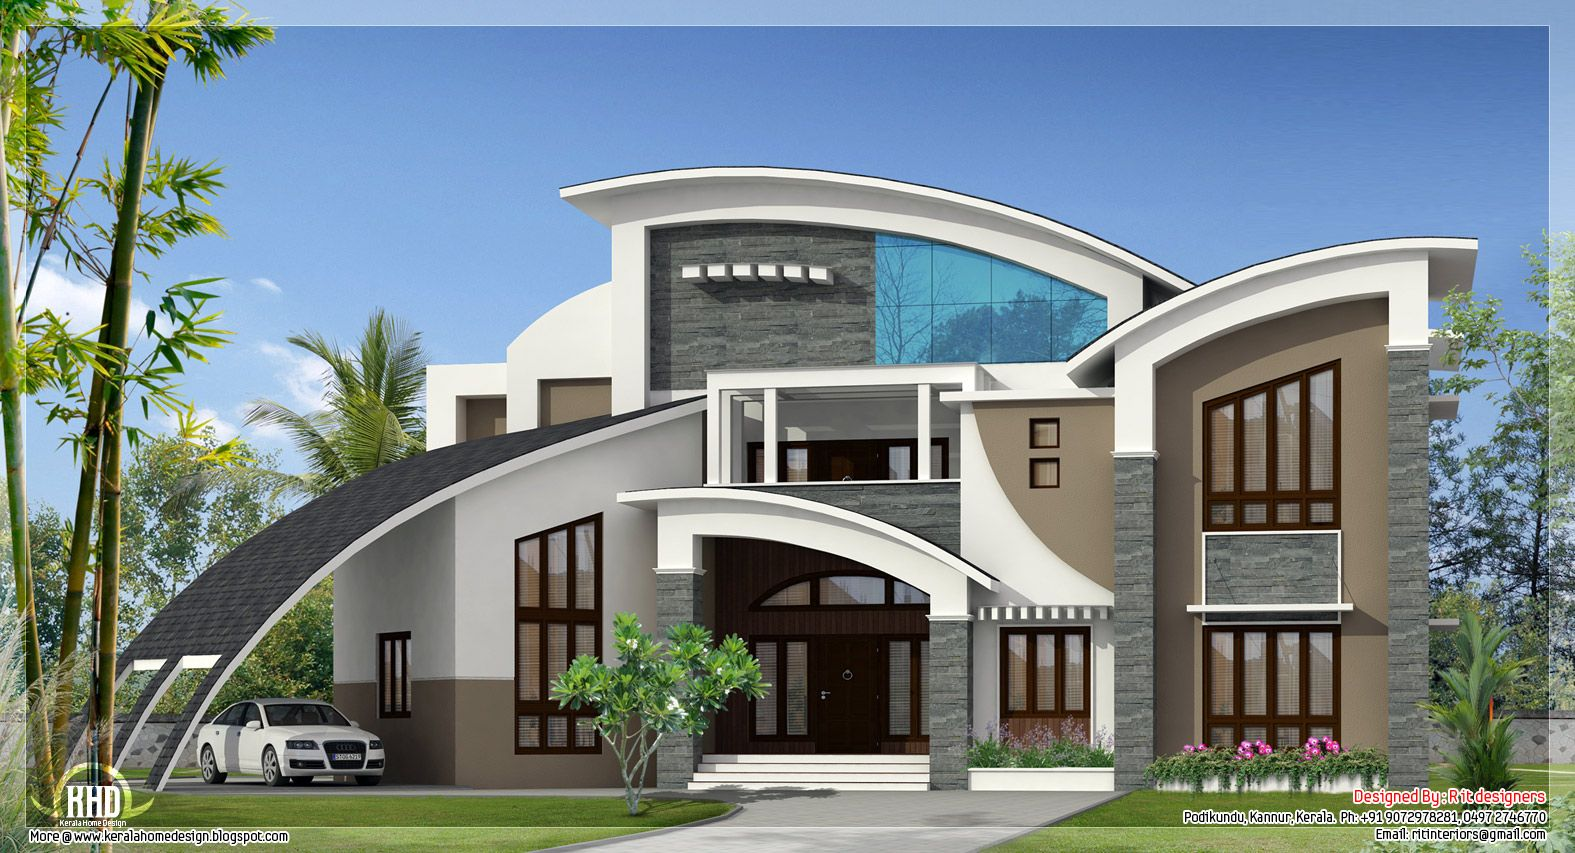 5870 square feet square meter square yards 5 bedroom super luxury kerala villa design by r it designers kannur kerala house i